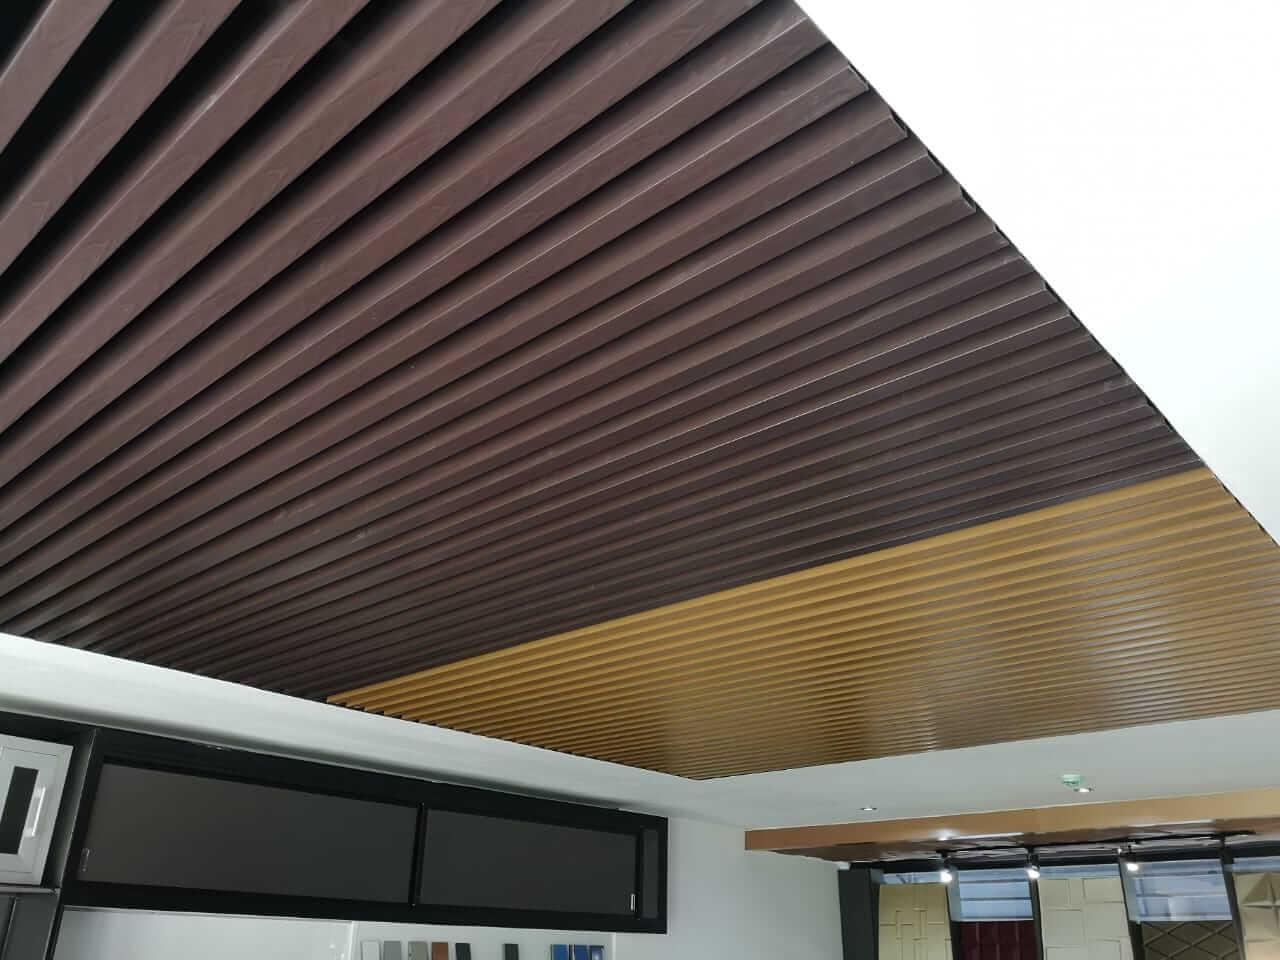 Eco Wood (Cielo Raso PVC) Image